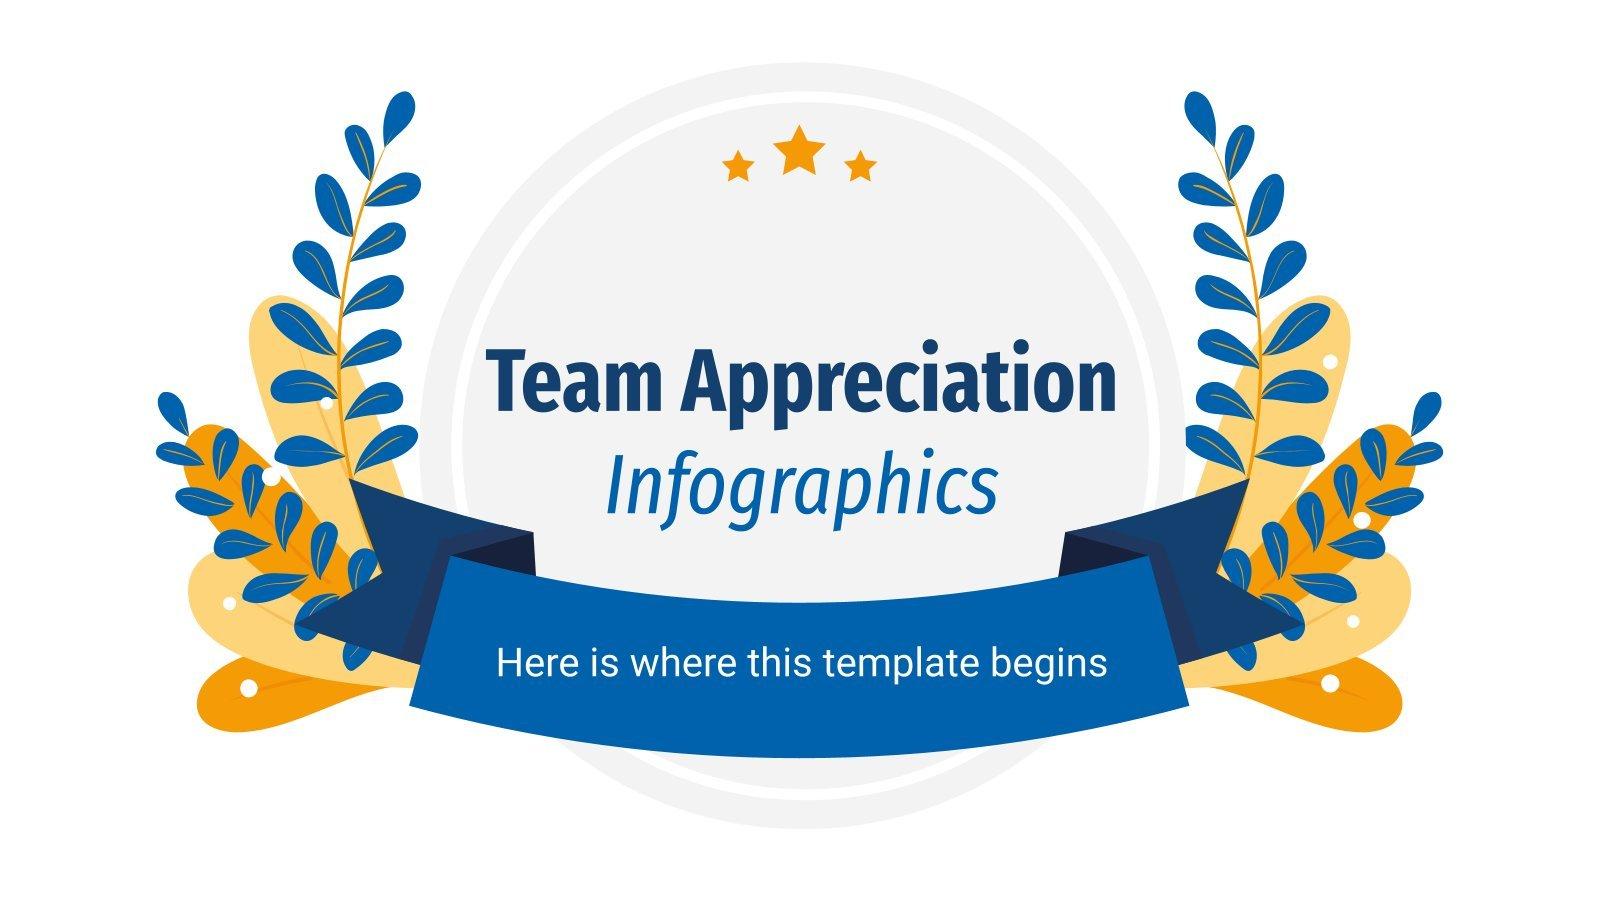 Team Appreciation Infographics presentation template